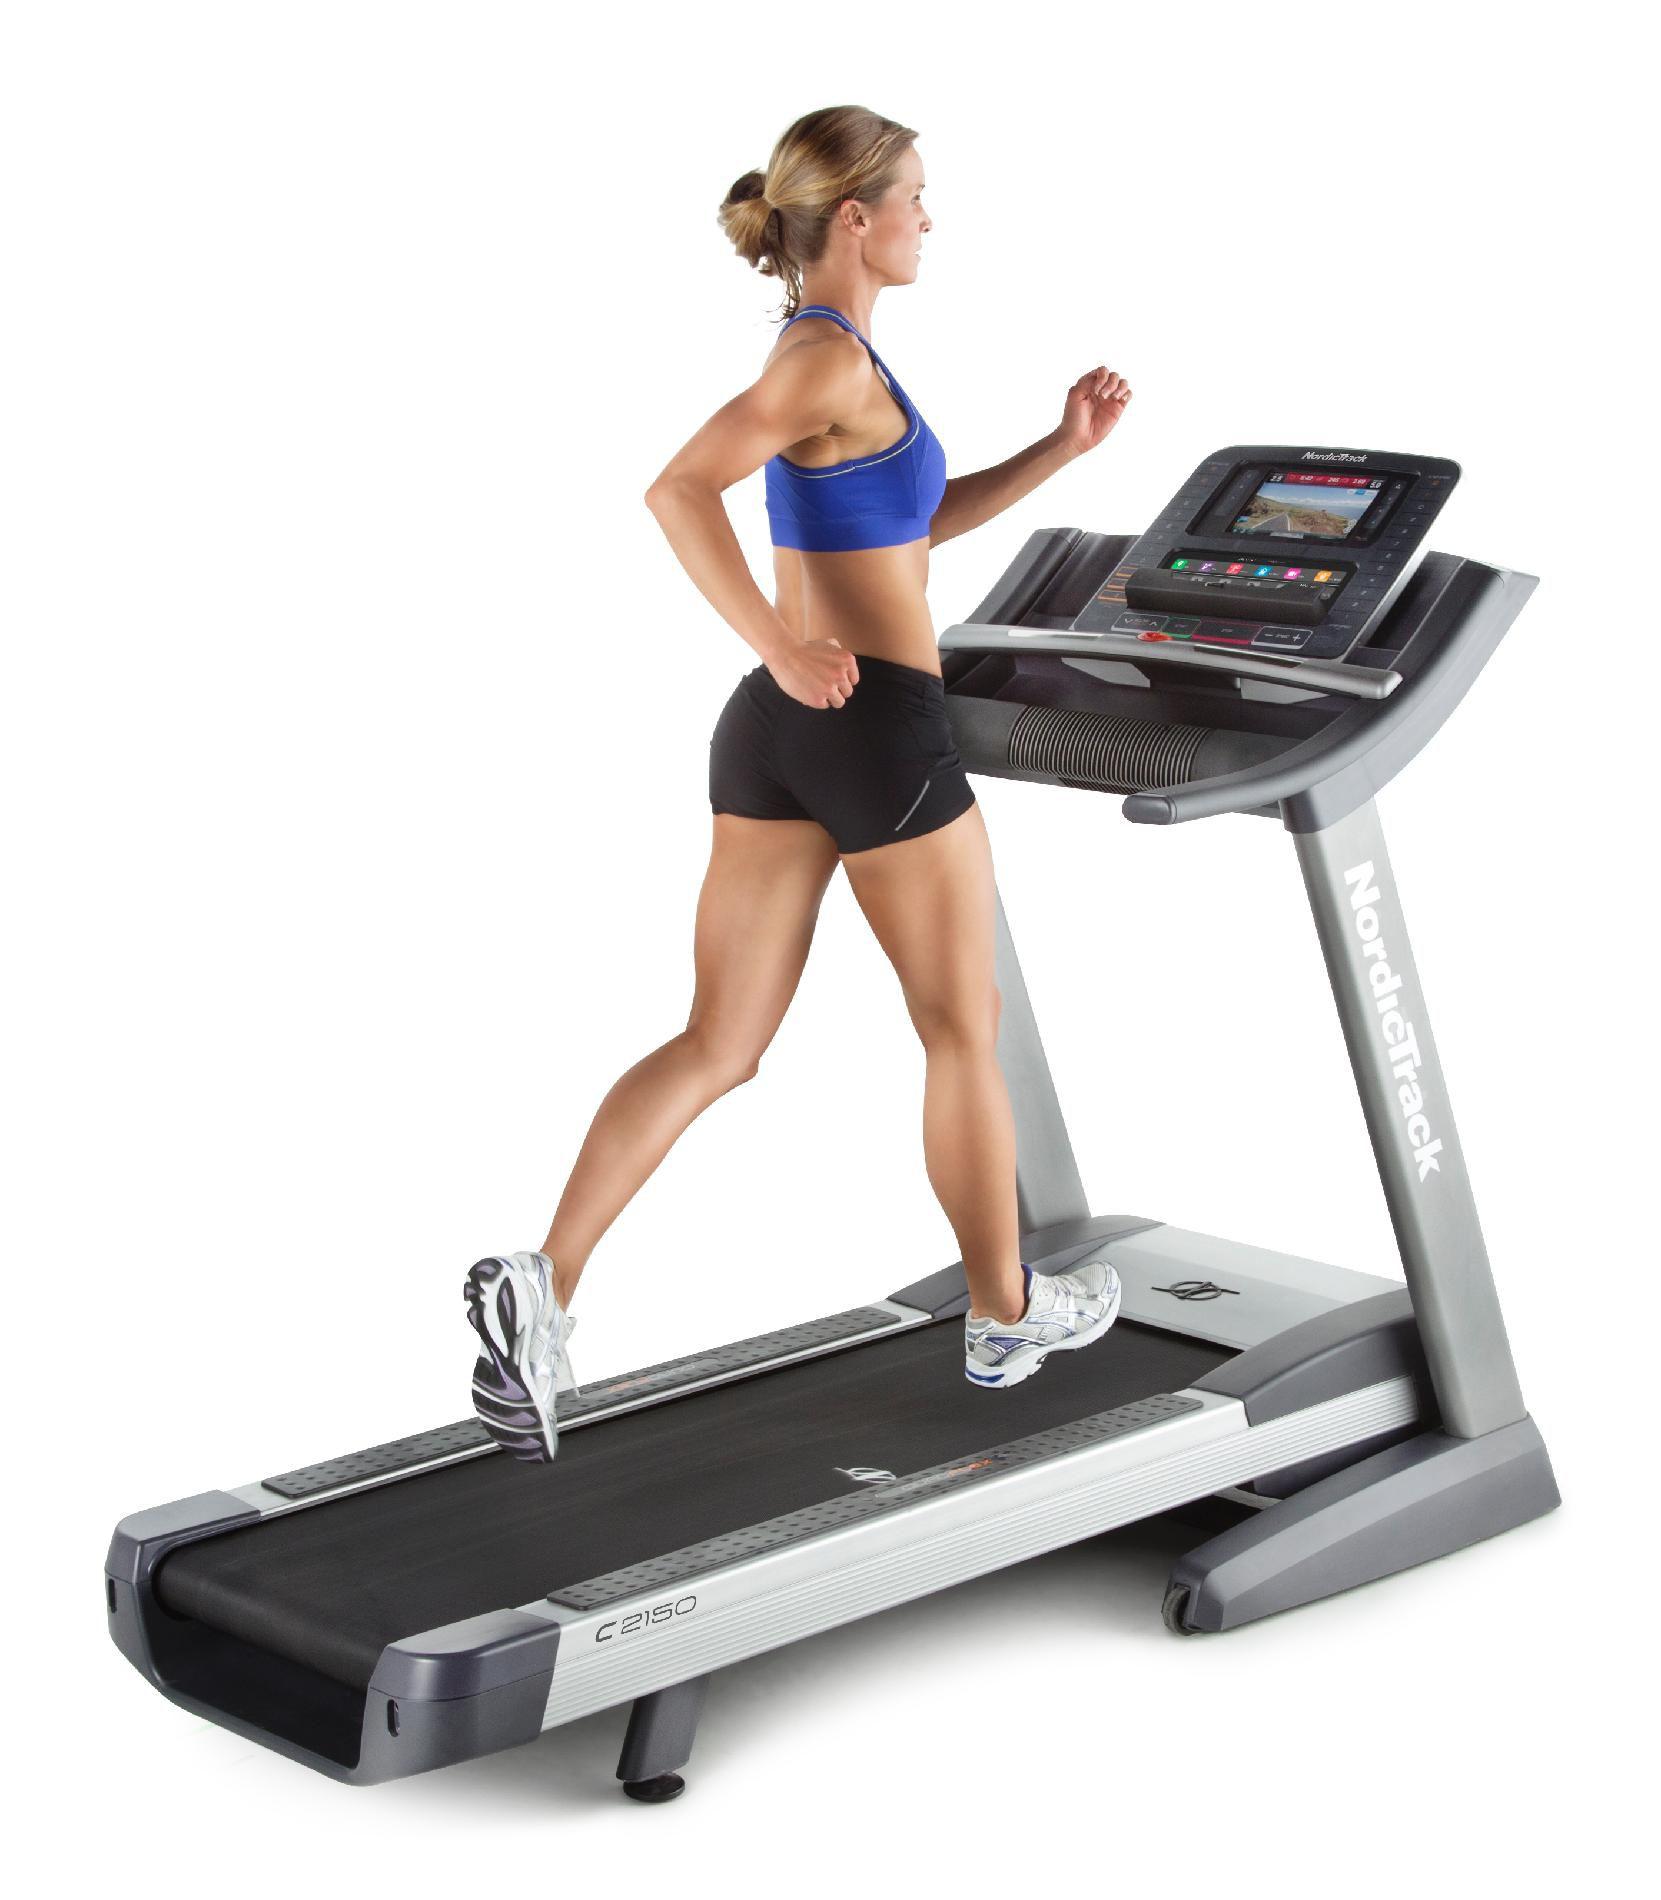 NordicTrack C2150 Treadmill